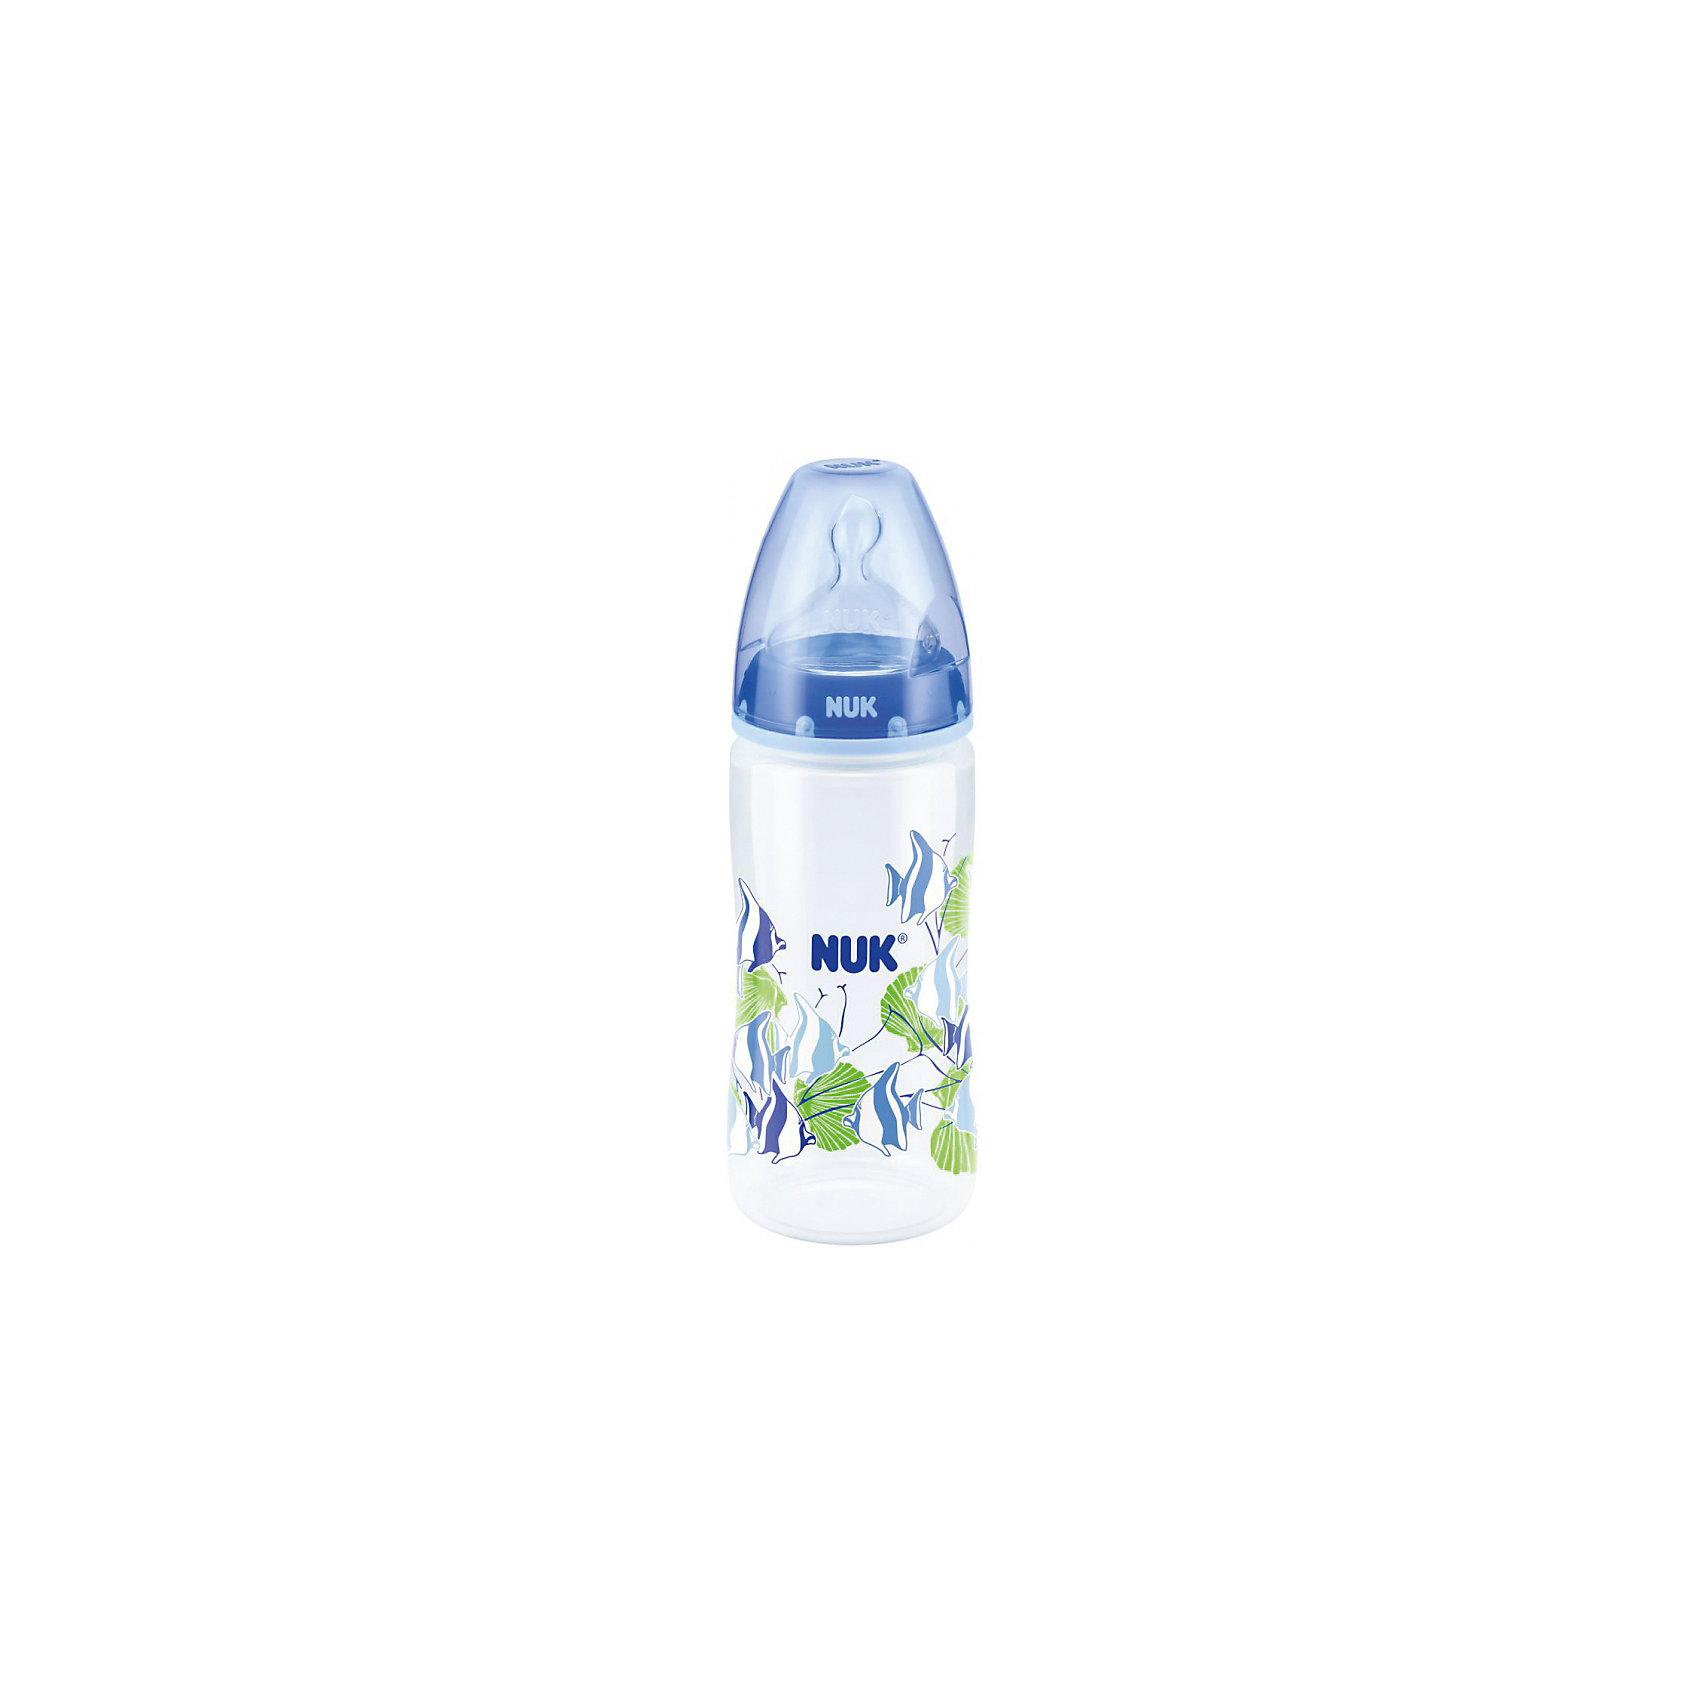 Бутылочка First Choice  пласт. (ПП) 300 мл. разноцв.+ соска с вент. из сил. р1, NUK